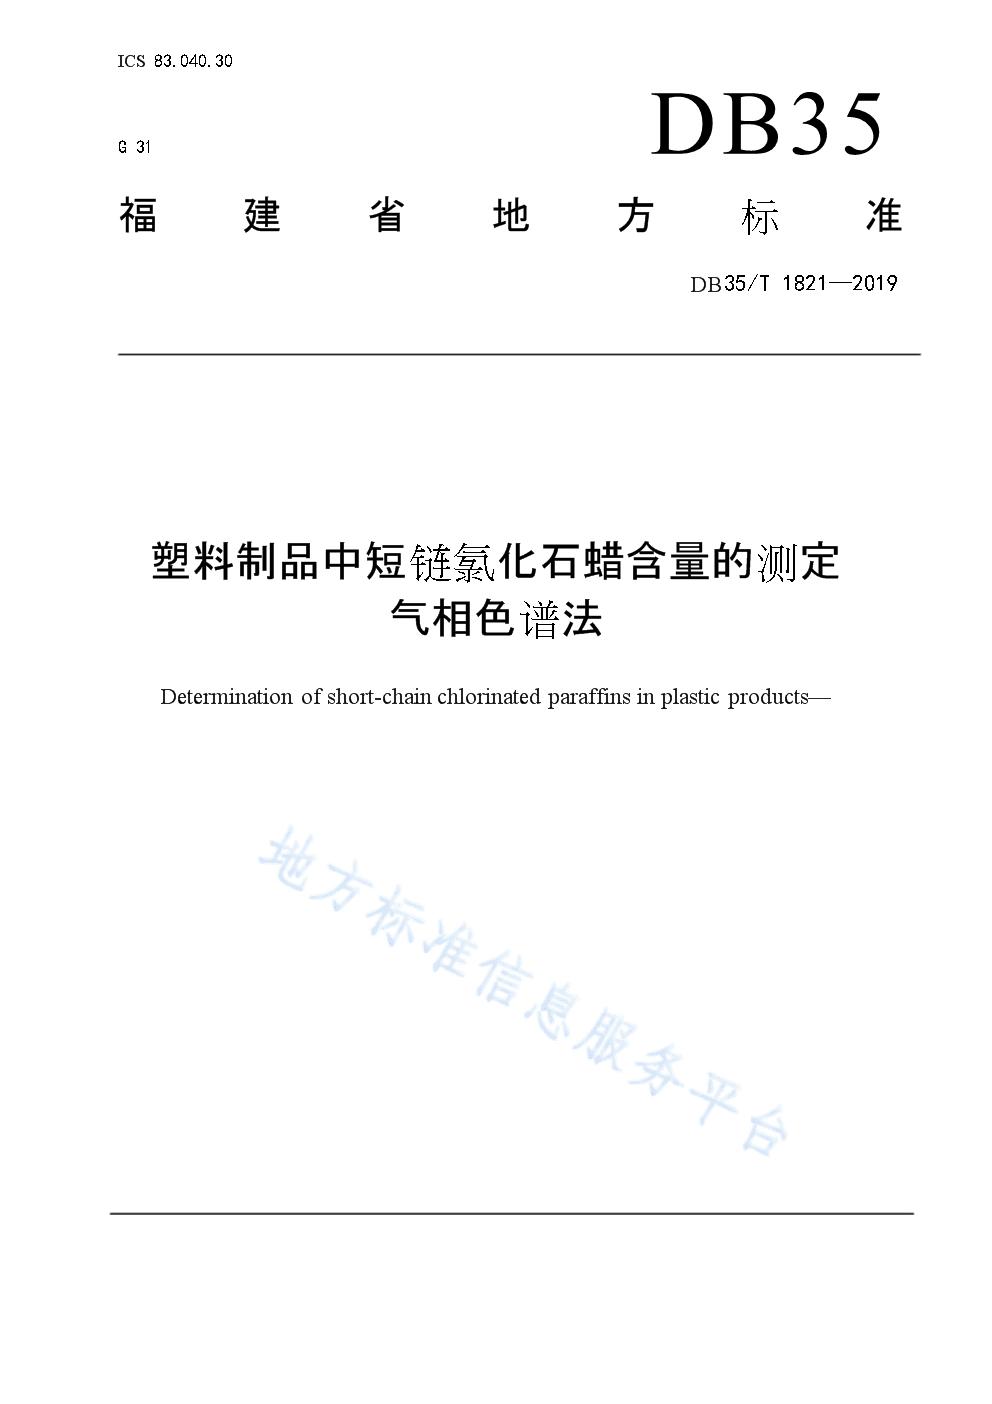 DB35_T 1821-2019 塑料制品中短链氯化石蜡含量的测定 气相色谱法.docx